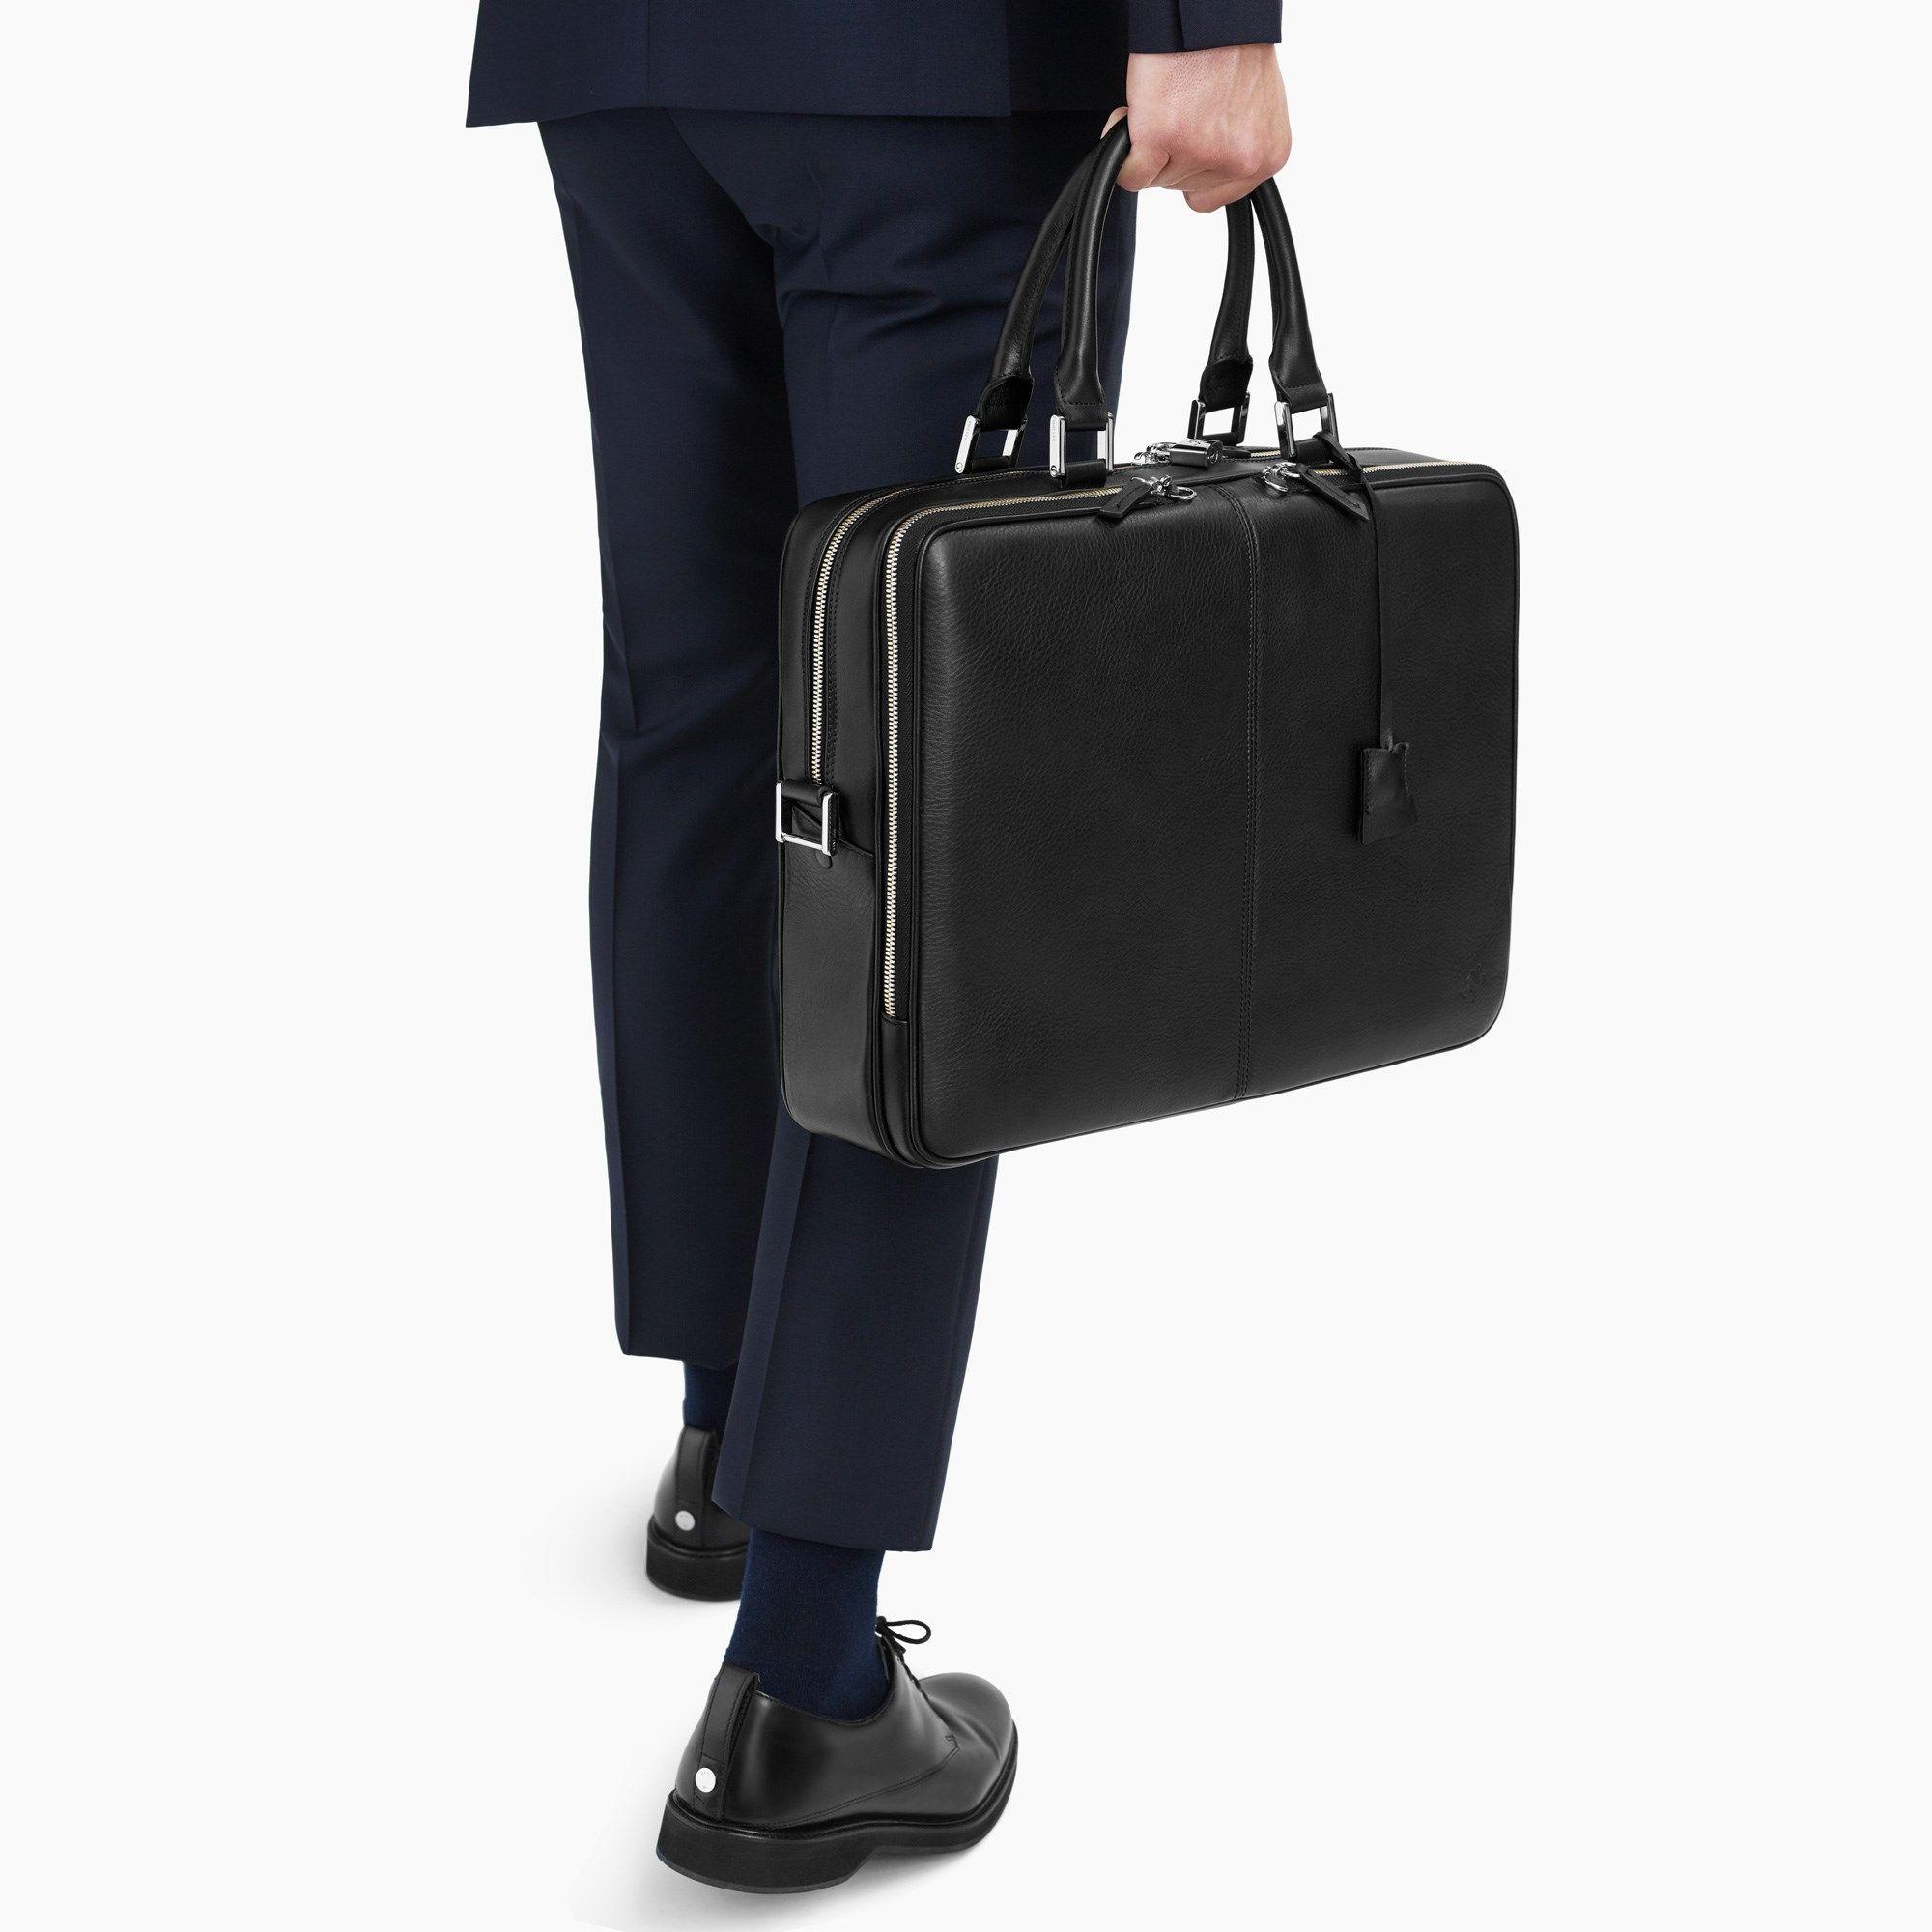 Trudeau 17 | Business Accessories | Minimalist bag